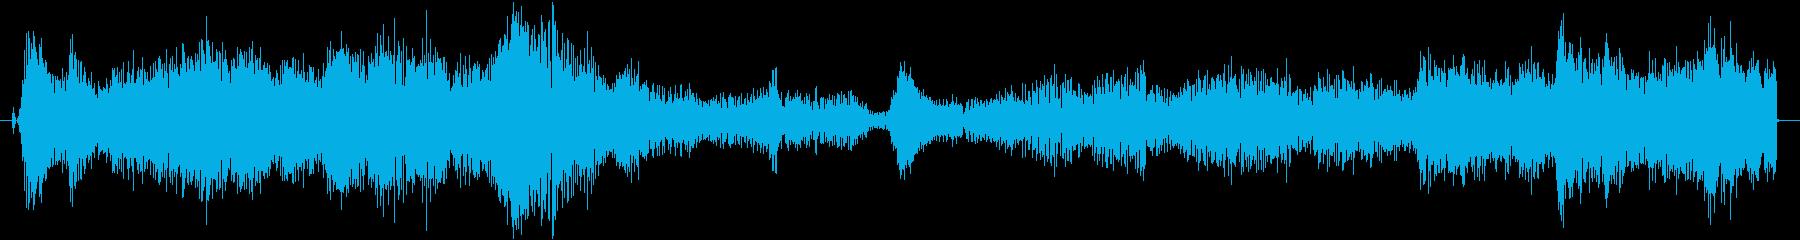 SFっぽくワープする感じの音の再生済みの波形